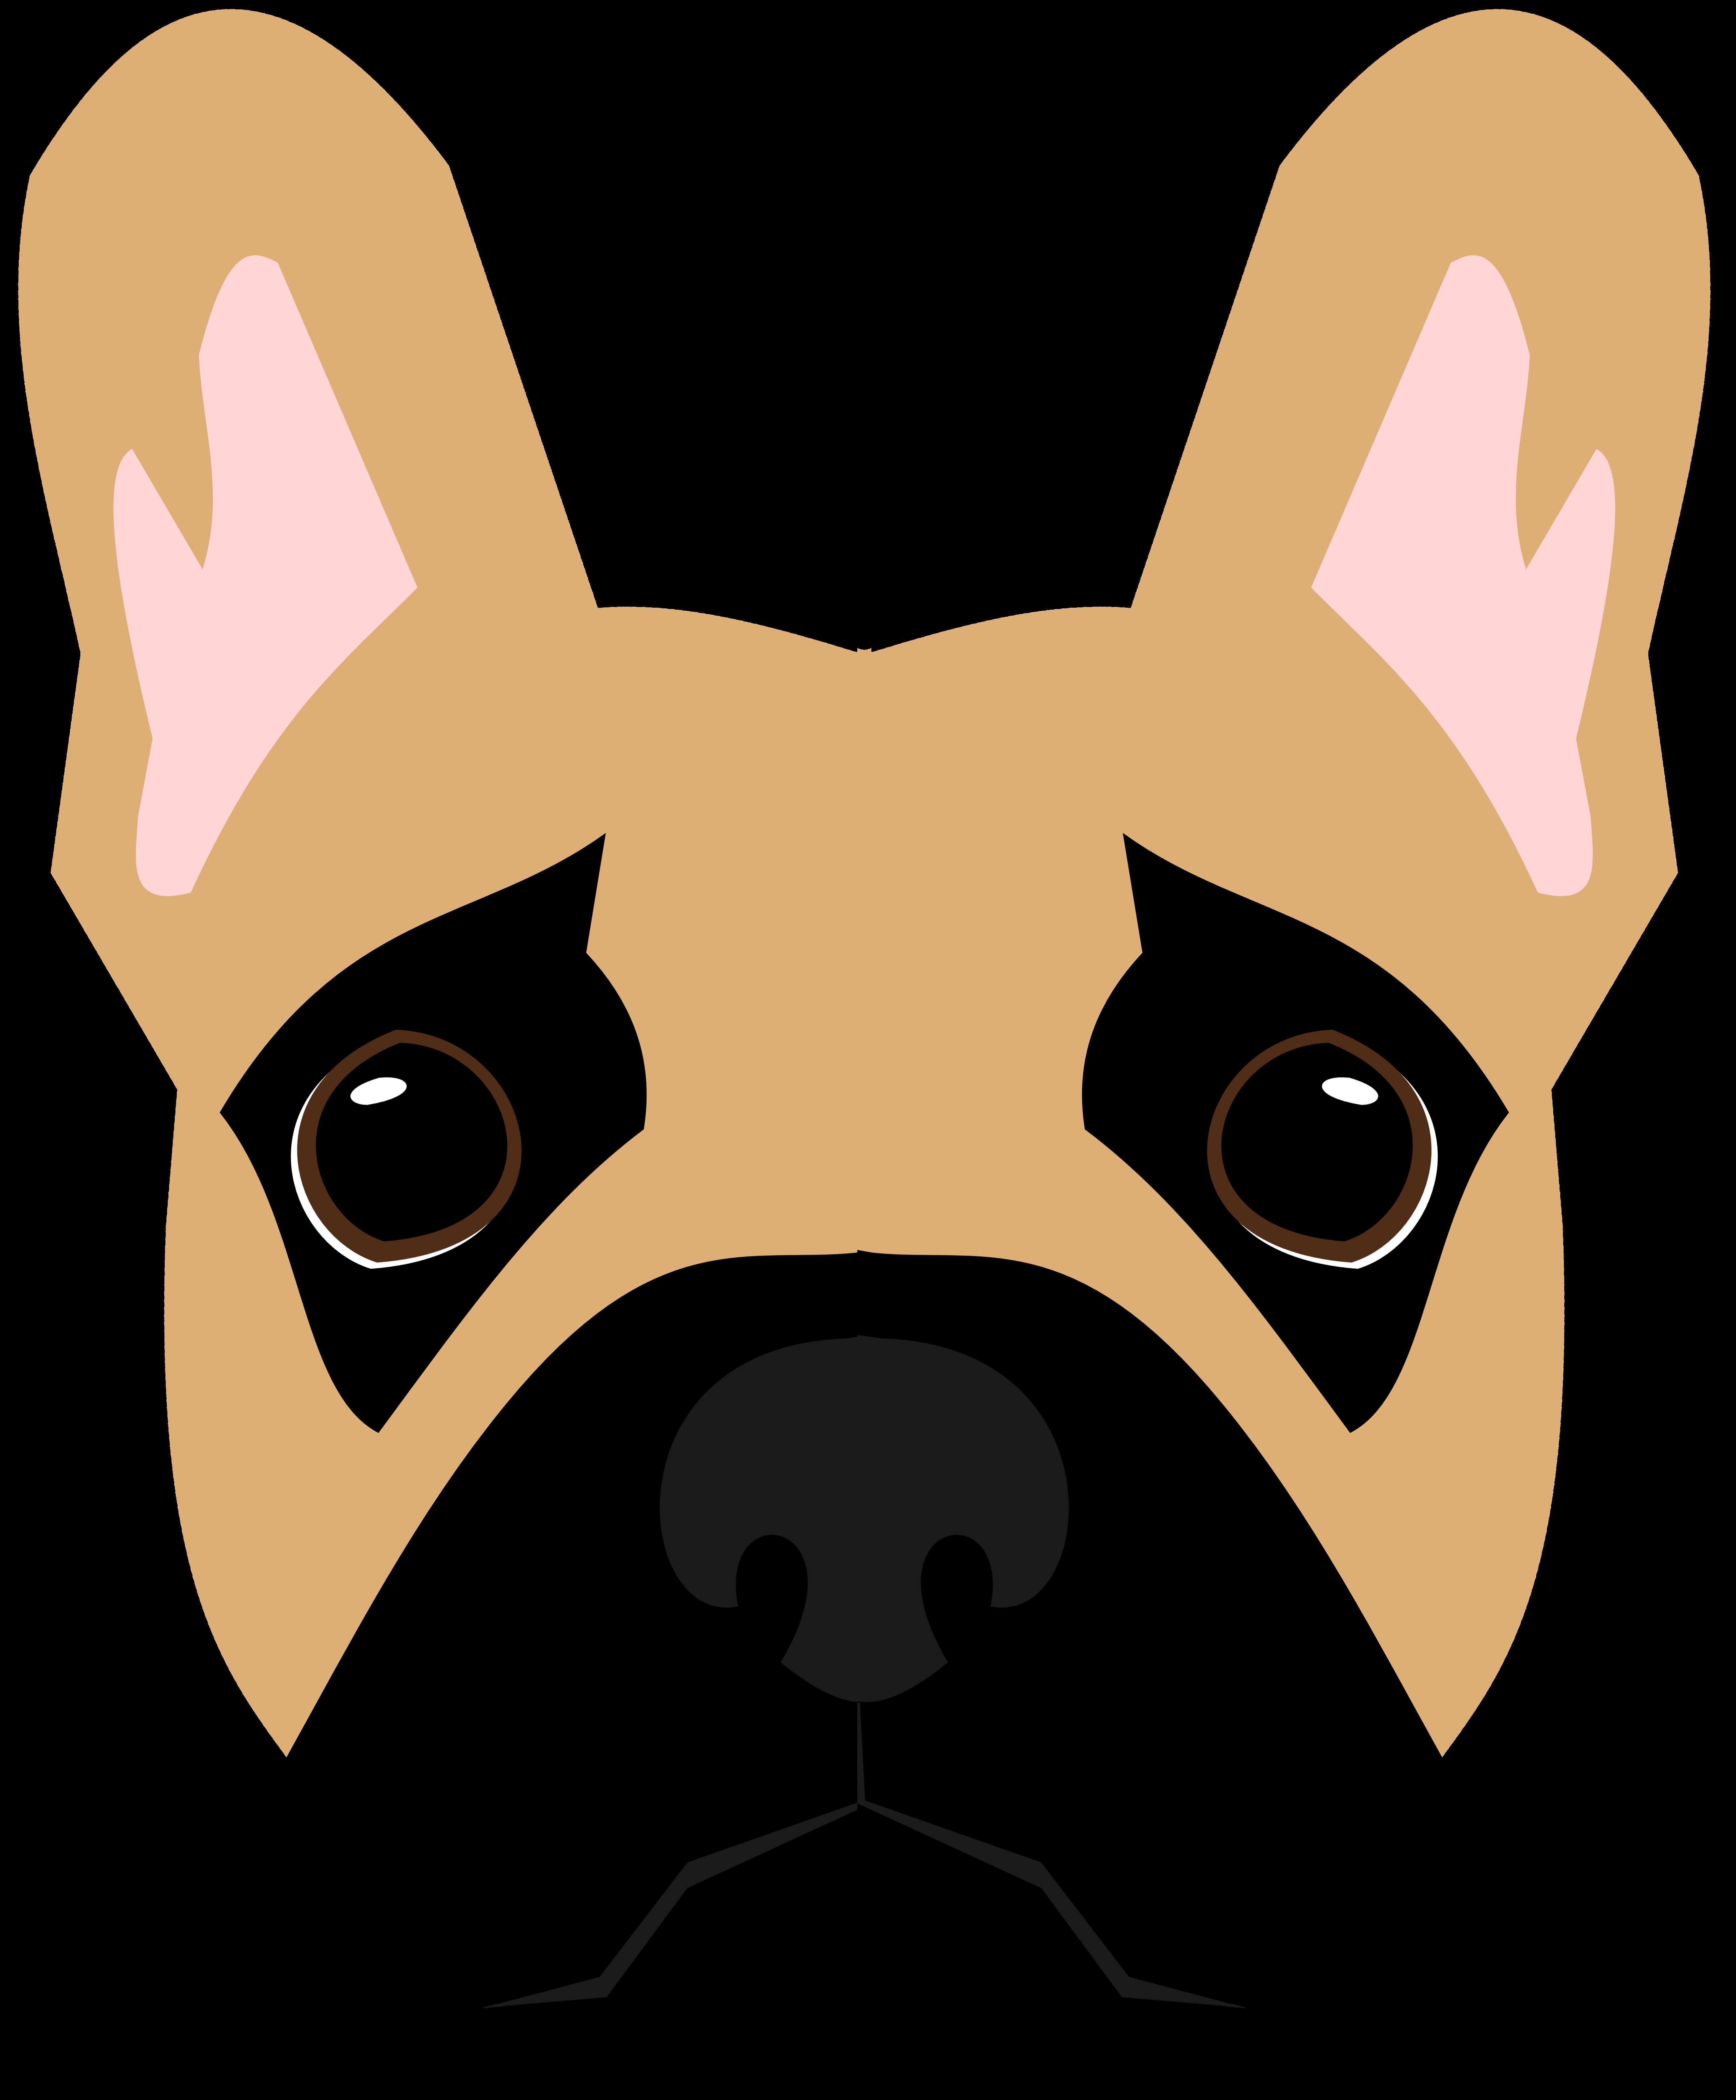 Scottie dog clipart border clip art library download Frenchie vector | DOGART | Pinterest | Dolls and Patterns clip art library download